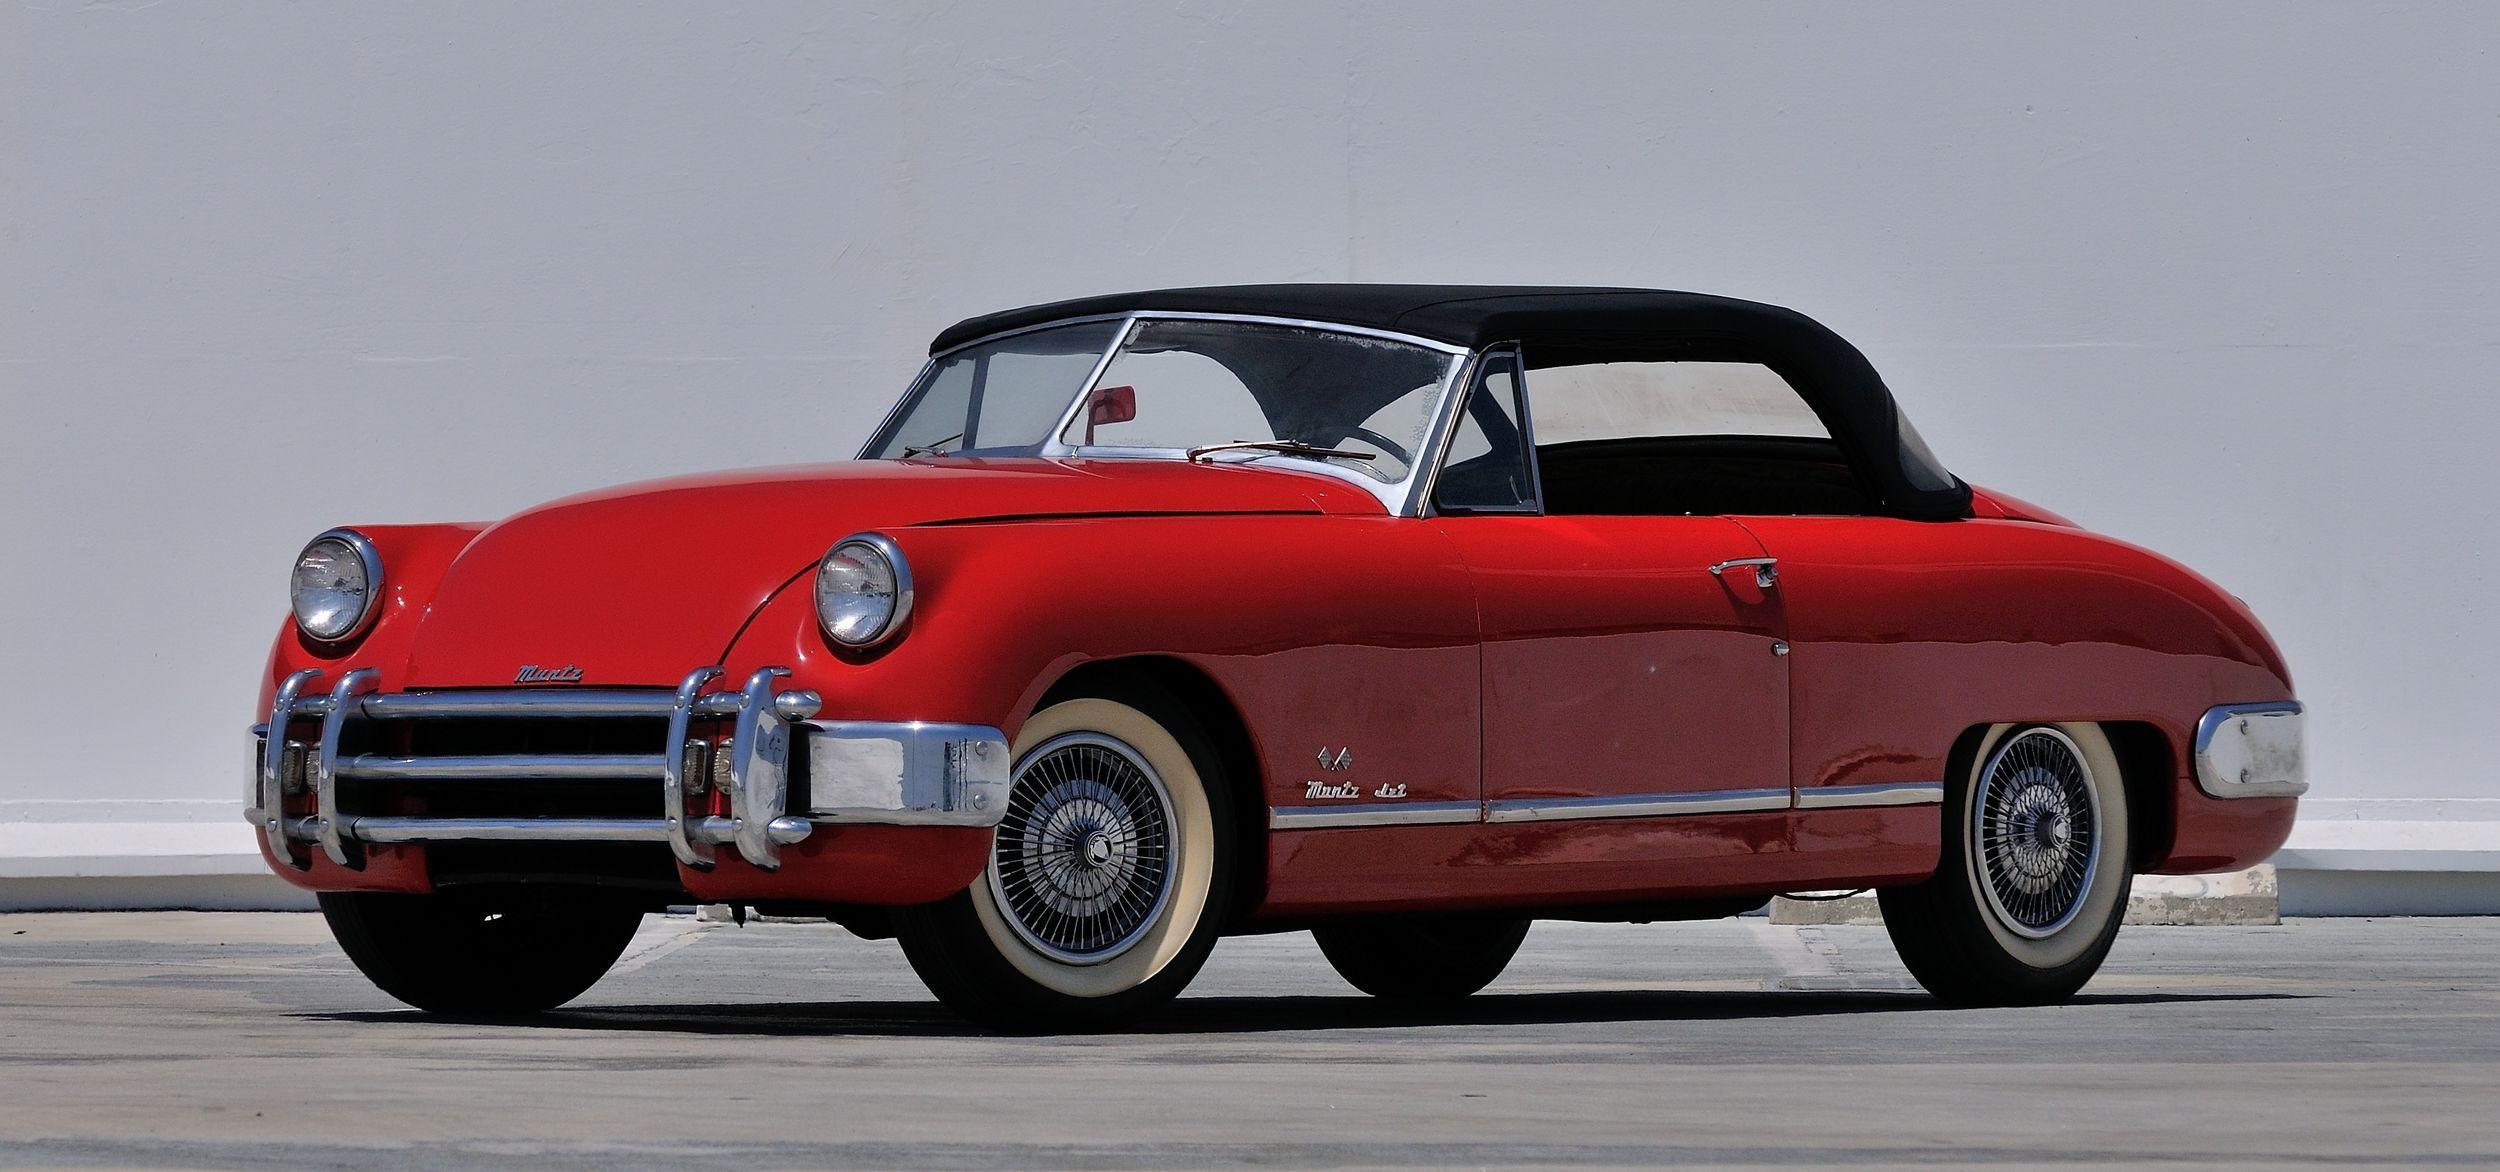 1951 Muntz Jet Vintage Cars Convertible Classic Cars